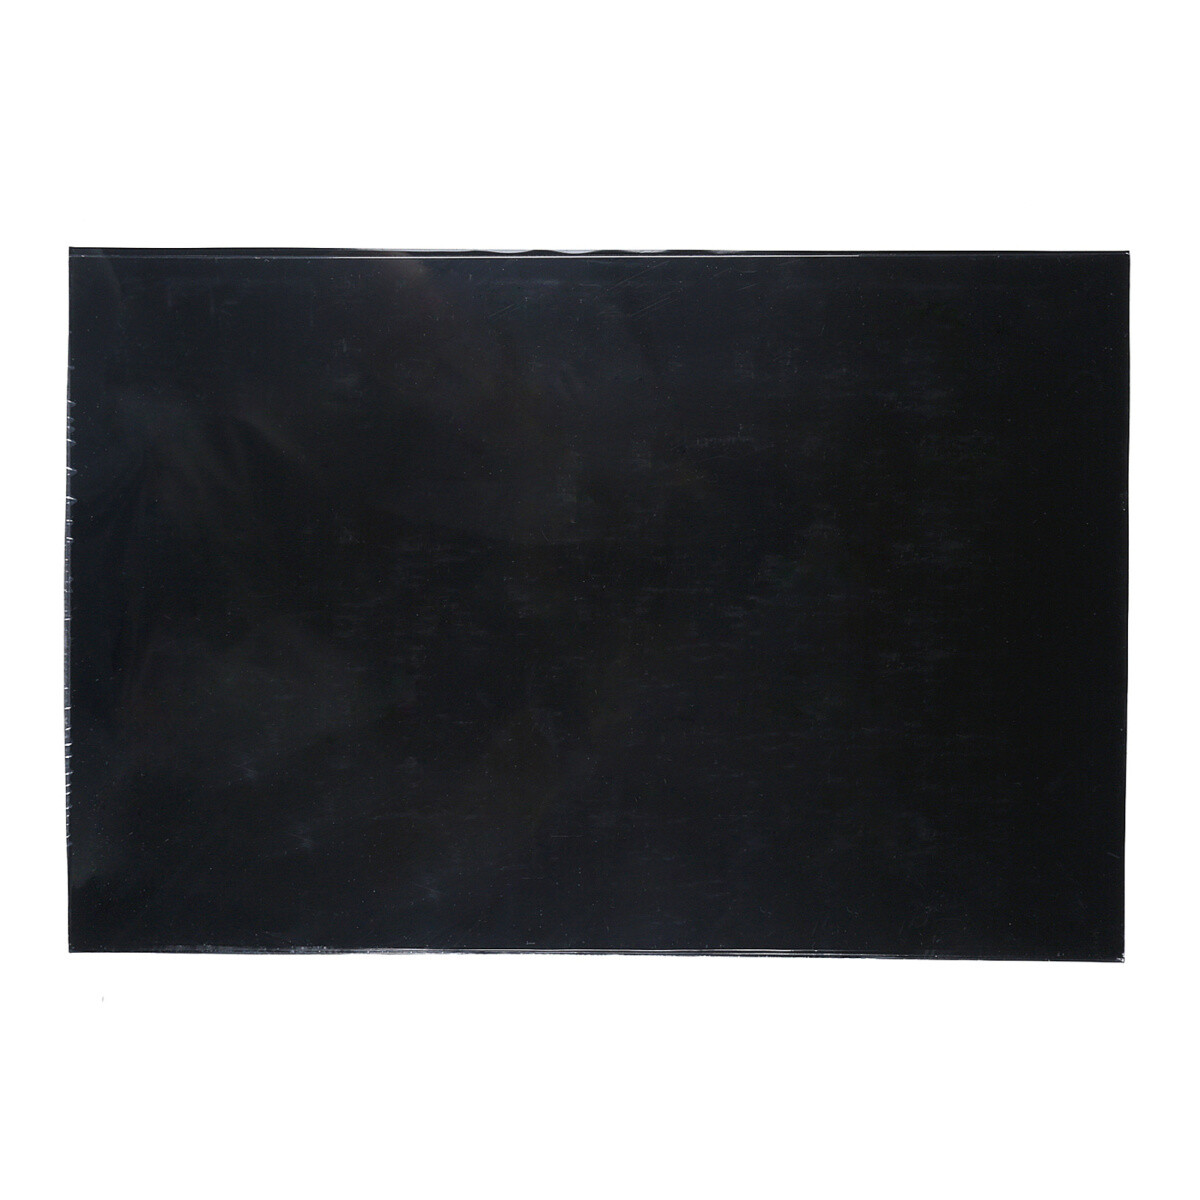 "Brio Pickguard Blanks 12"" x 17"" 1 Ply Matte Black"